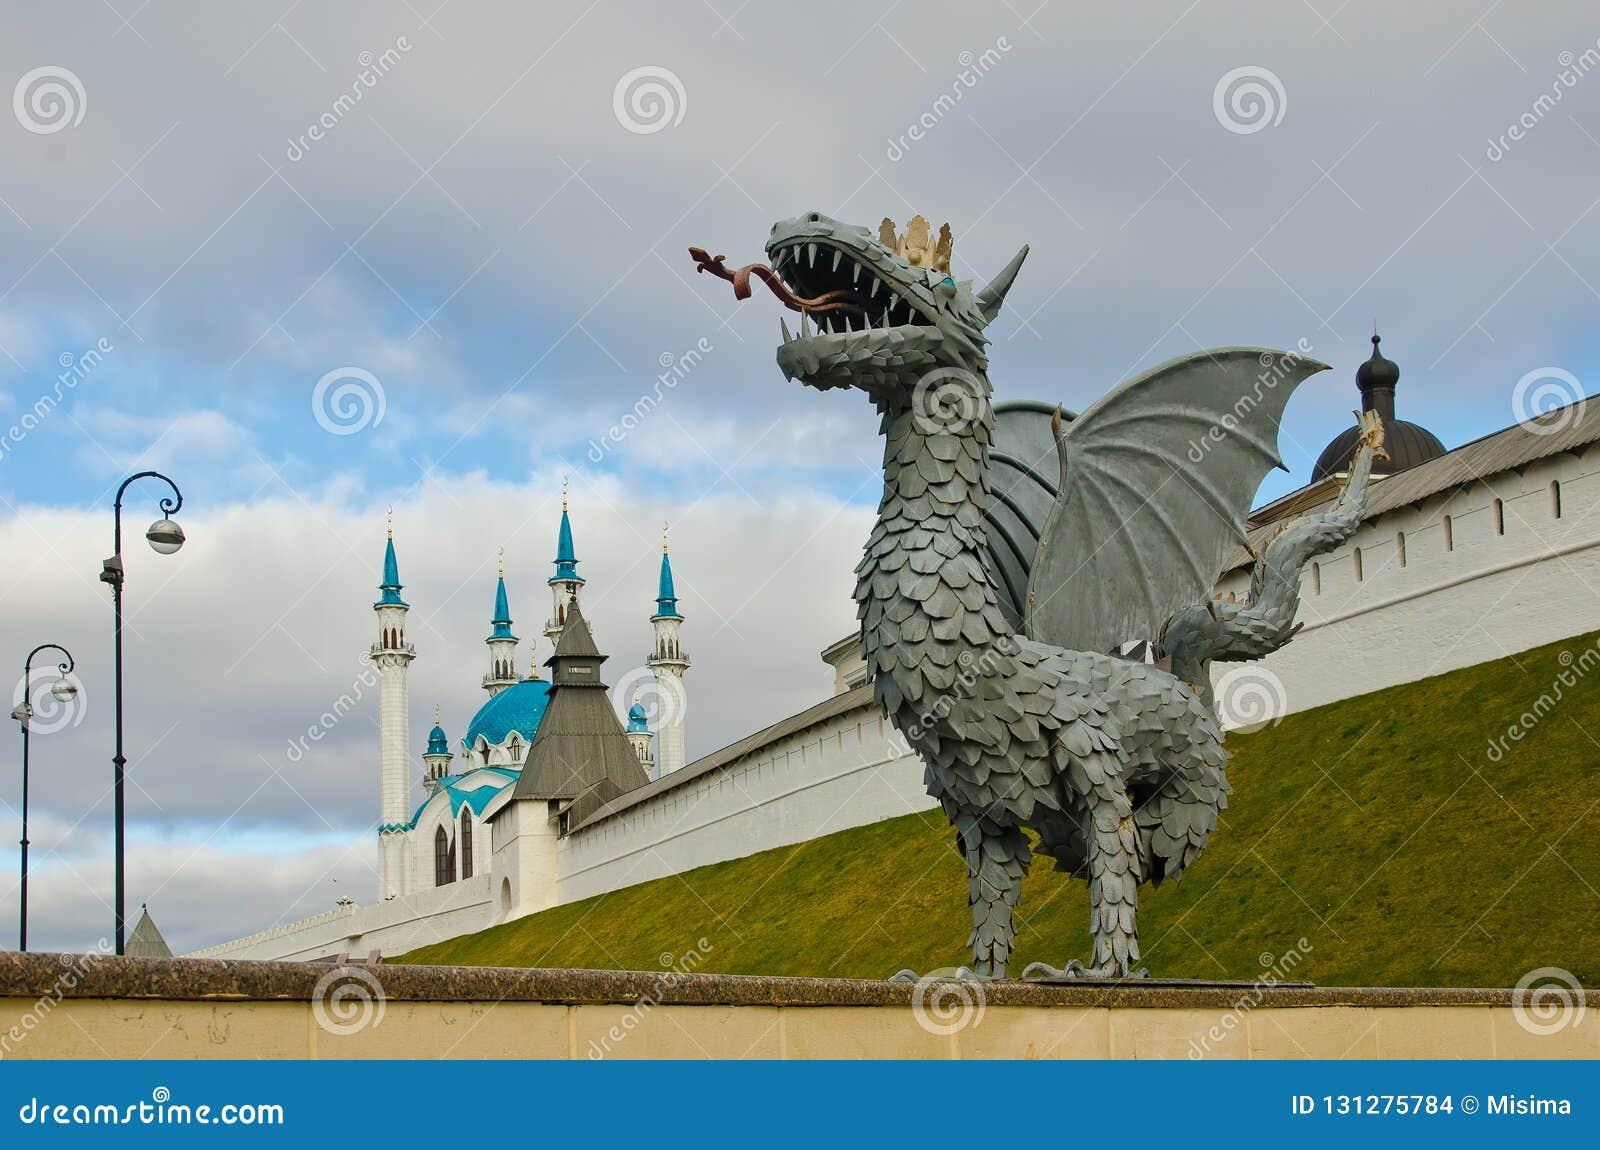 Zilant is the symbol of Kazan near the Kul Sharif Mosque